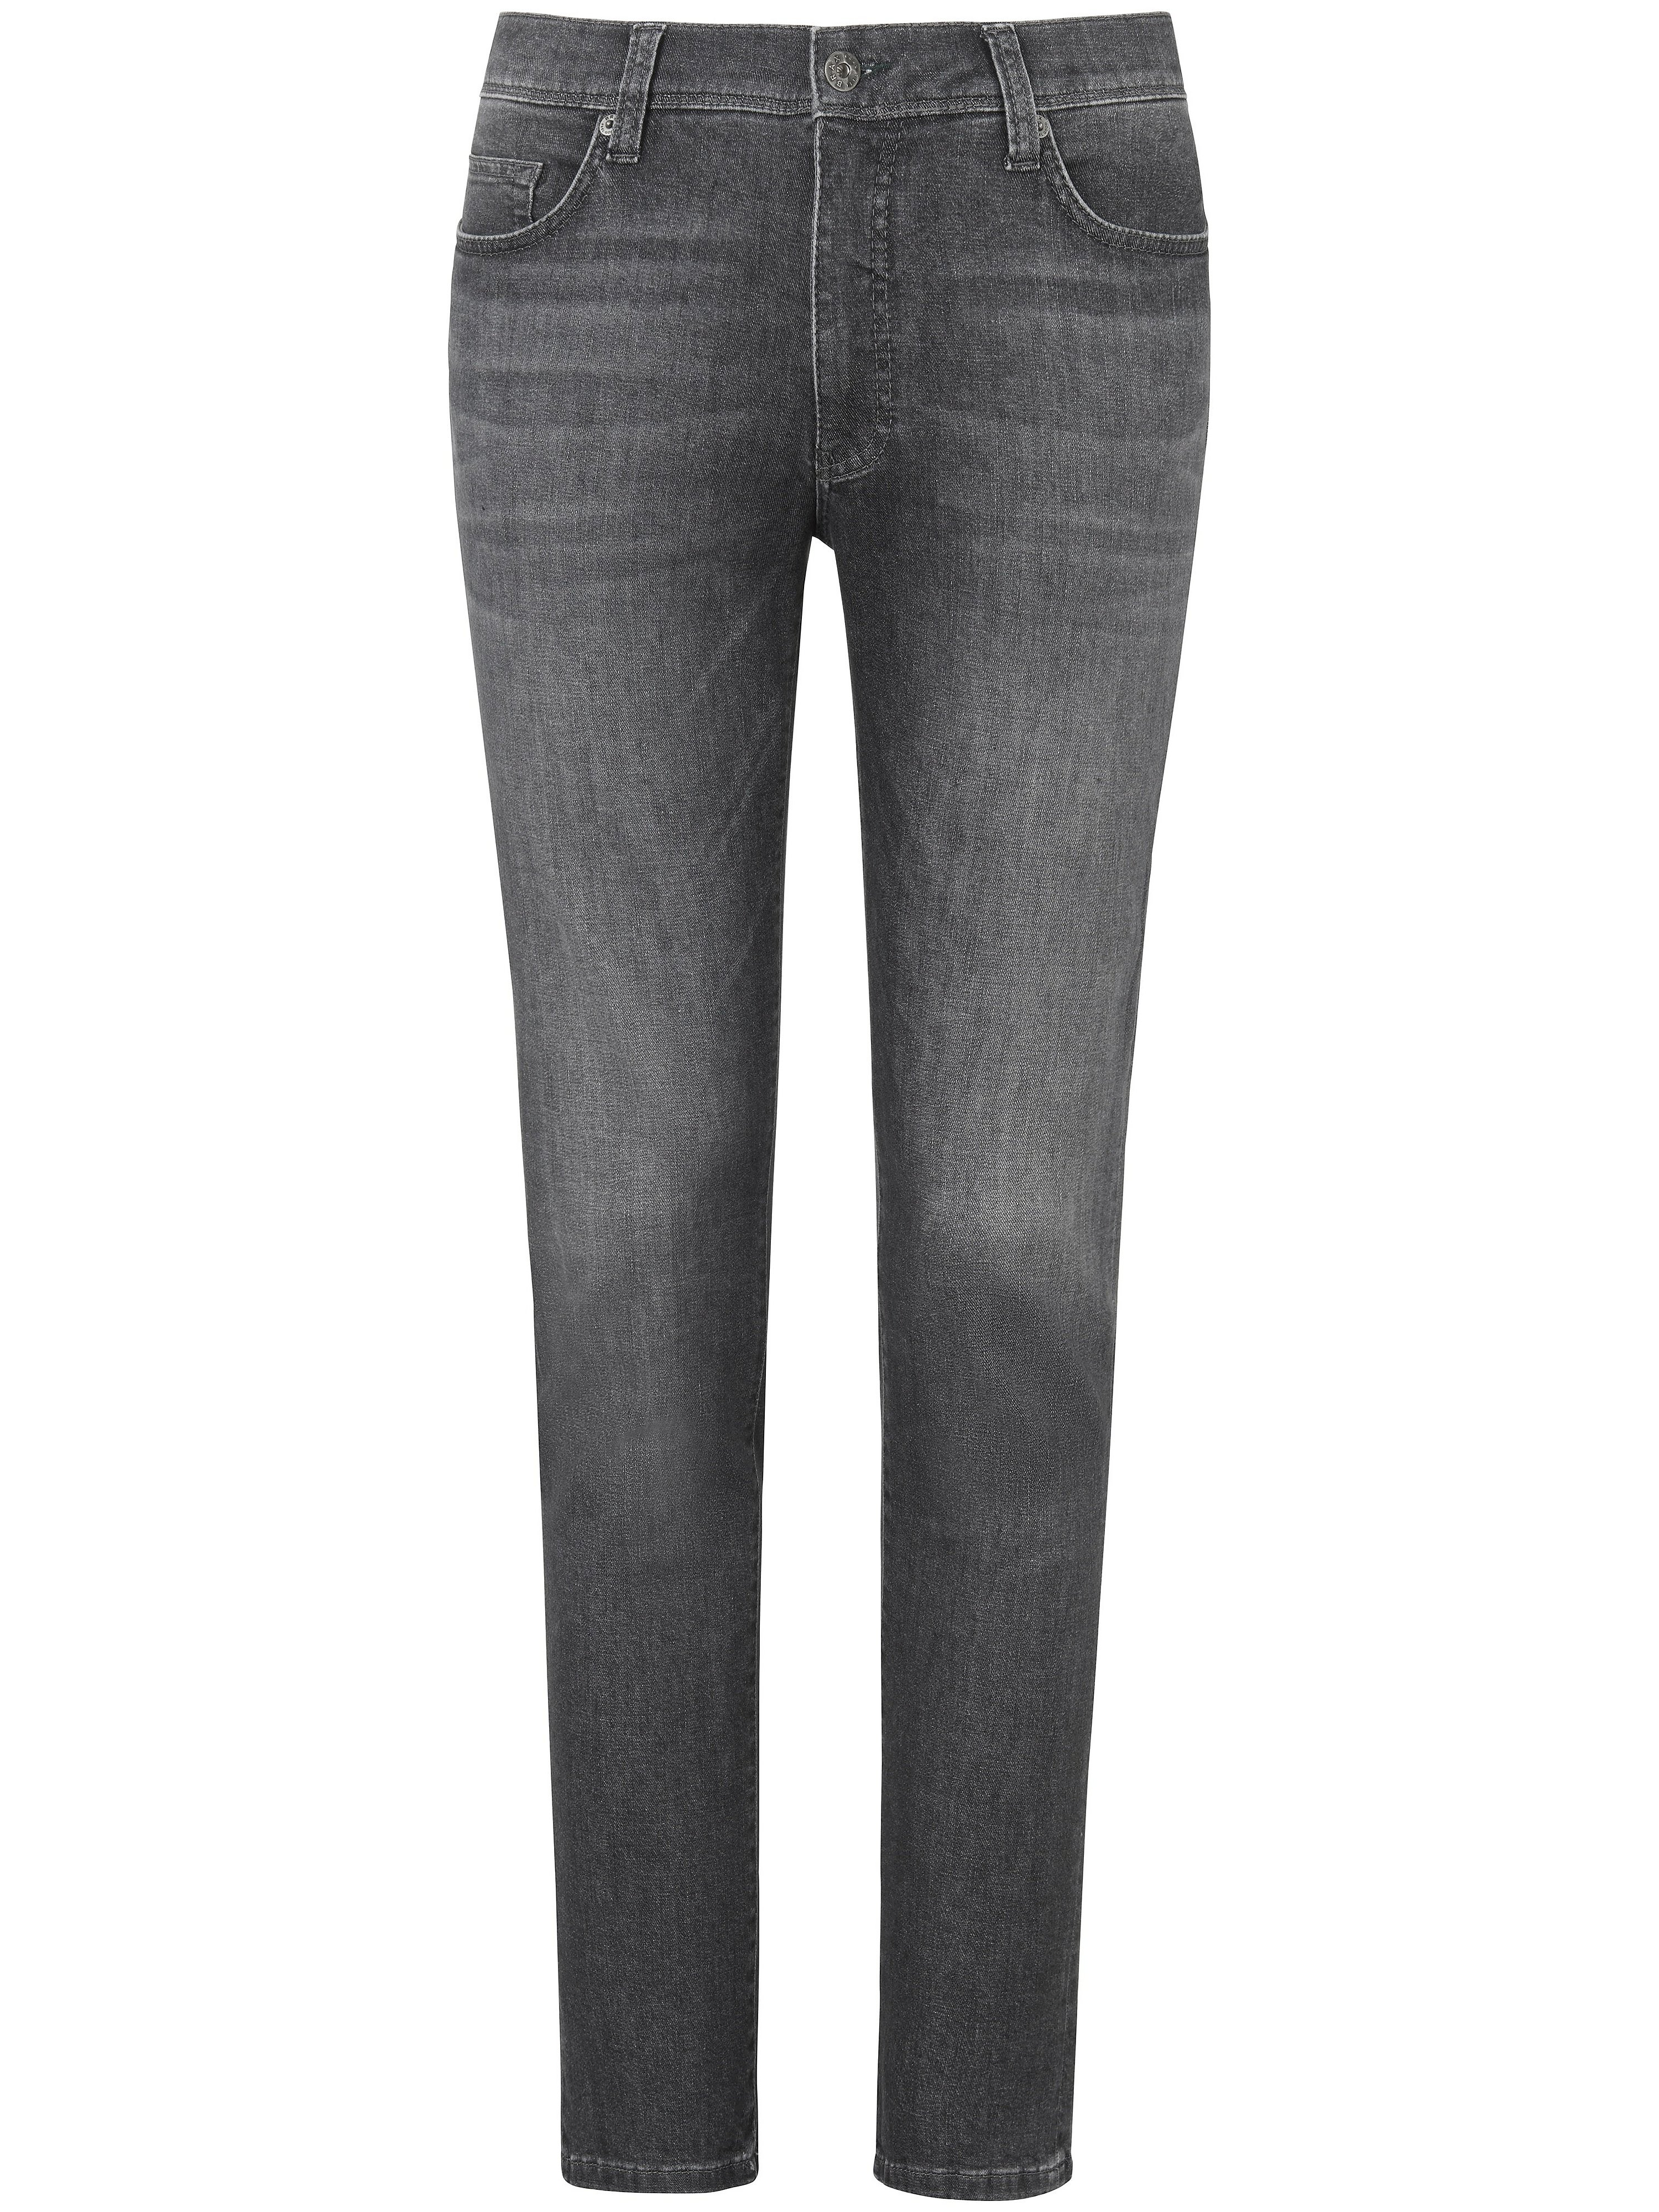 Jeans model Cadiz Van Brax Feel Good denim